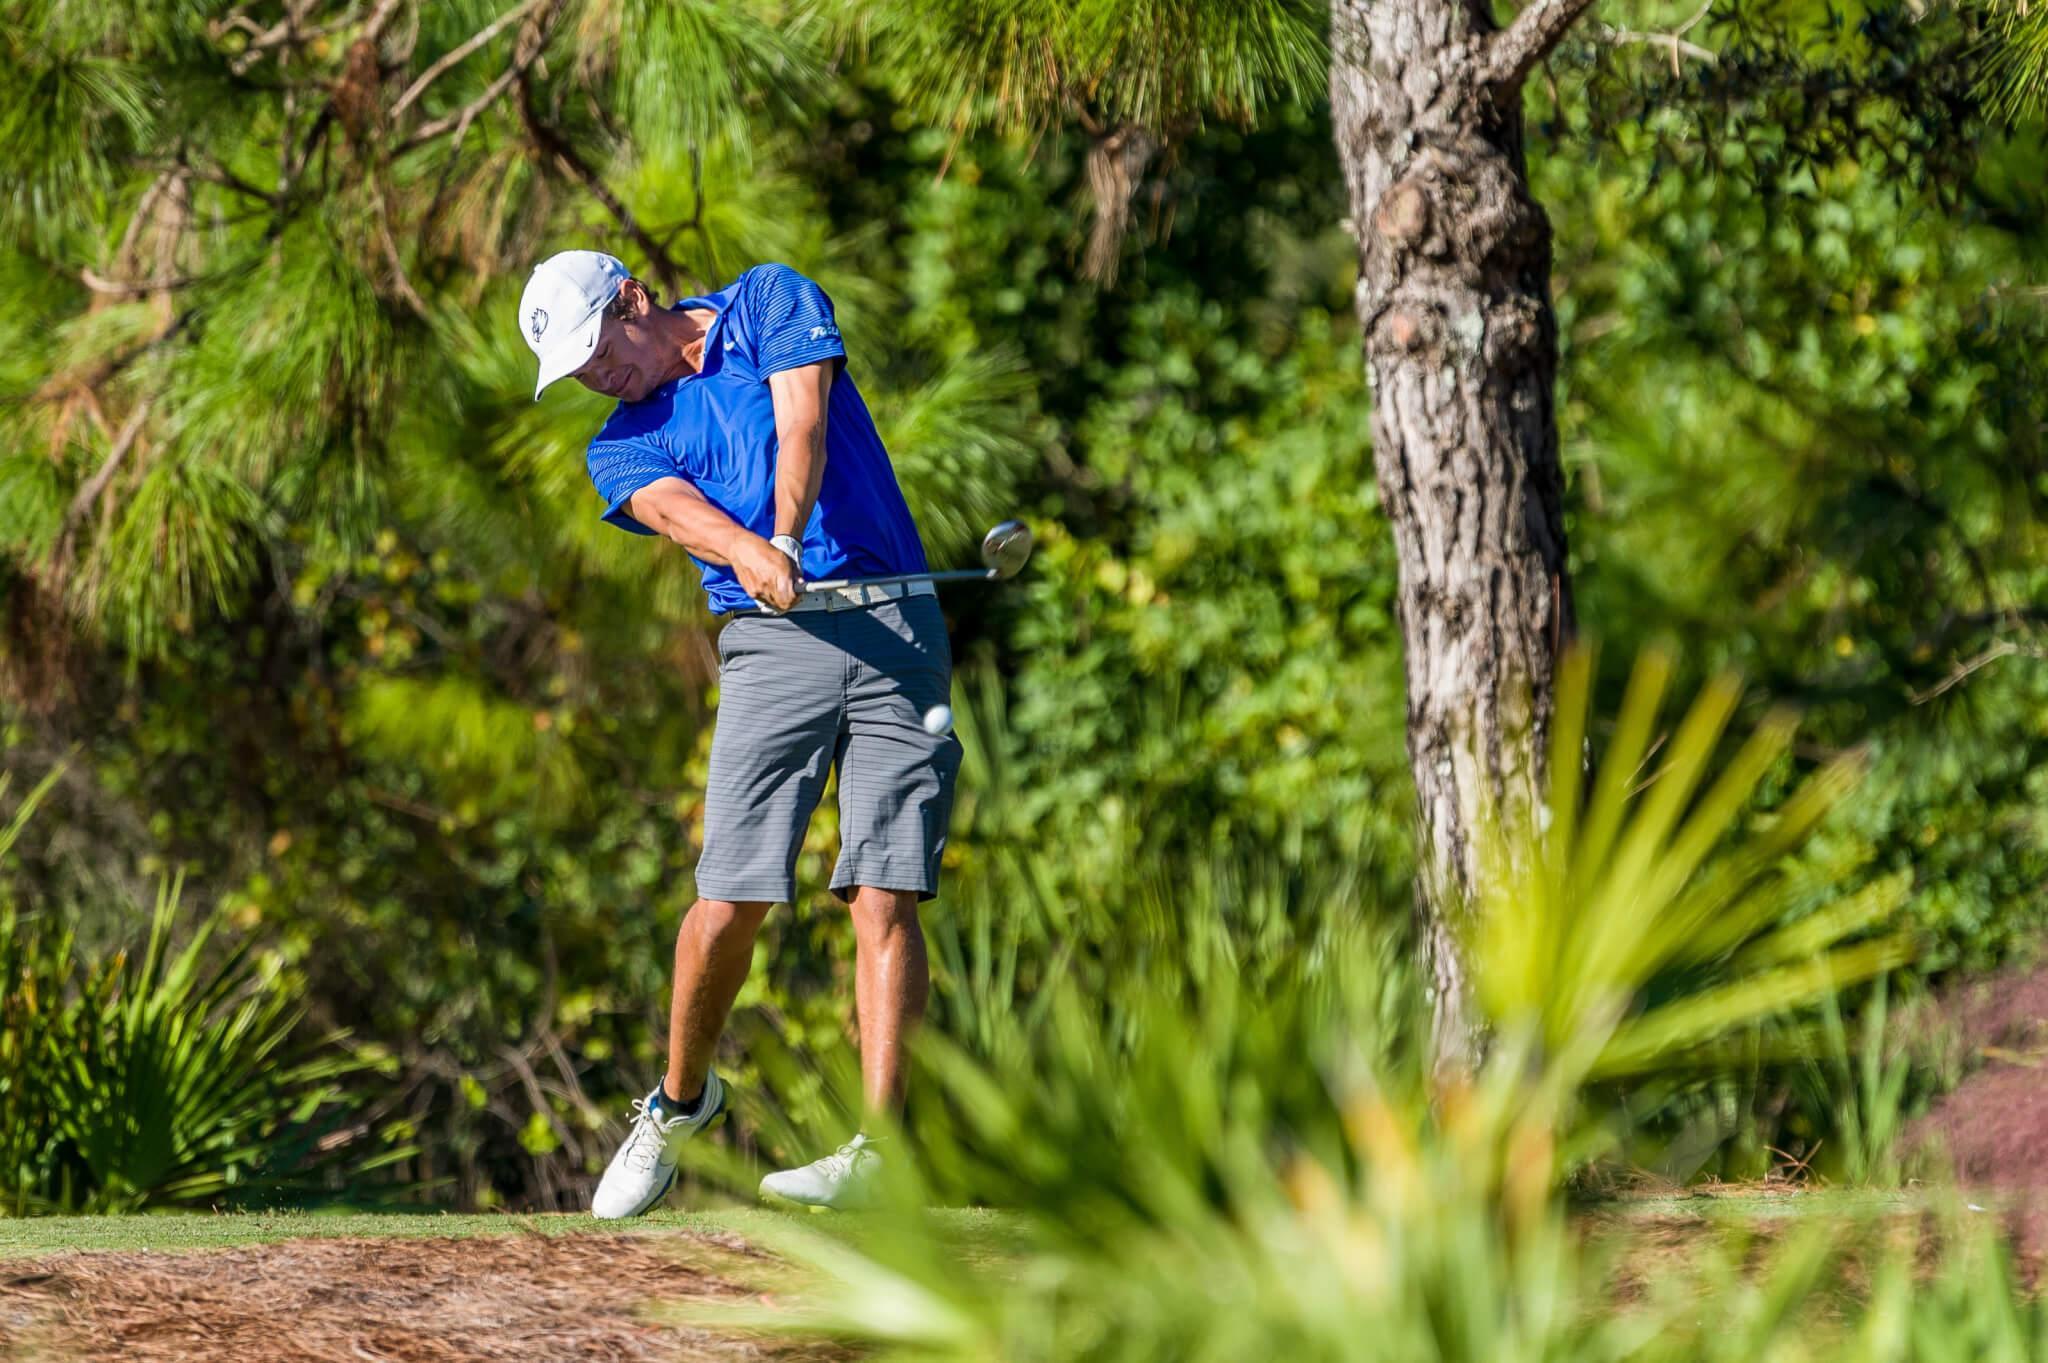 FGCU men's golf earns postseason accolades